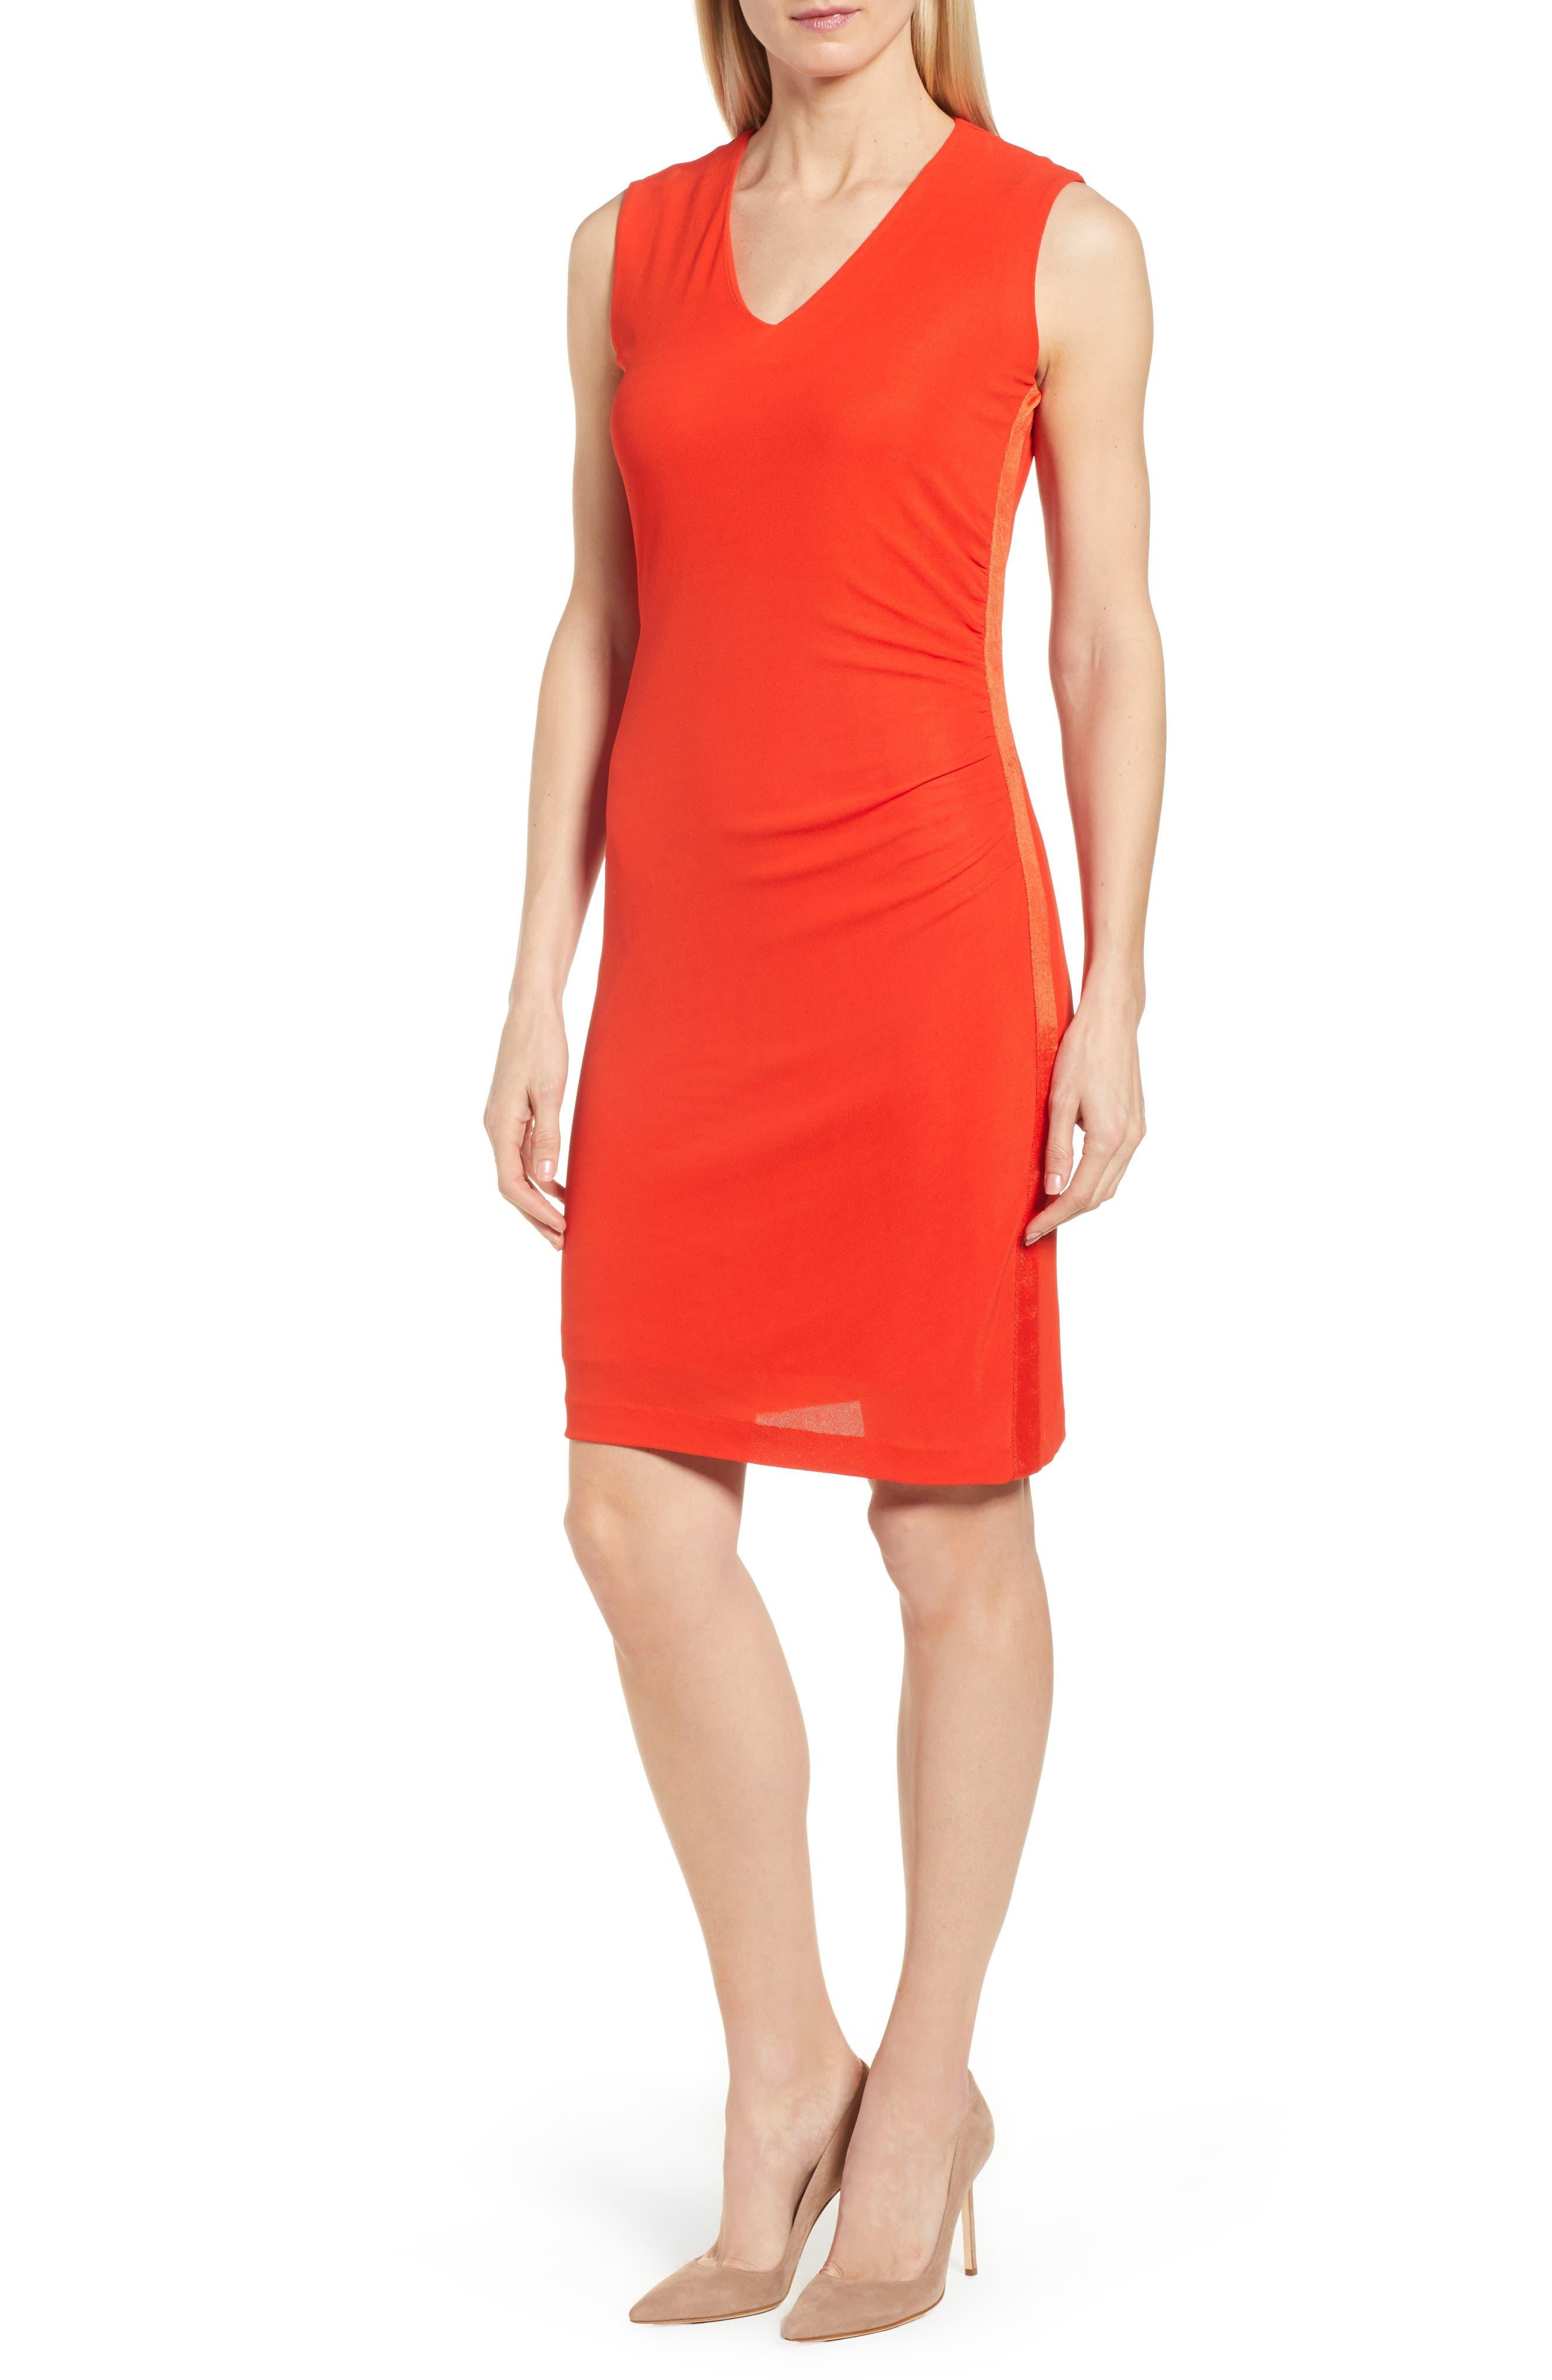 Erela Ruched Sheath Dress,                             Main thumbnail 1, color,                             824